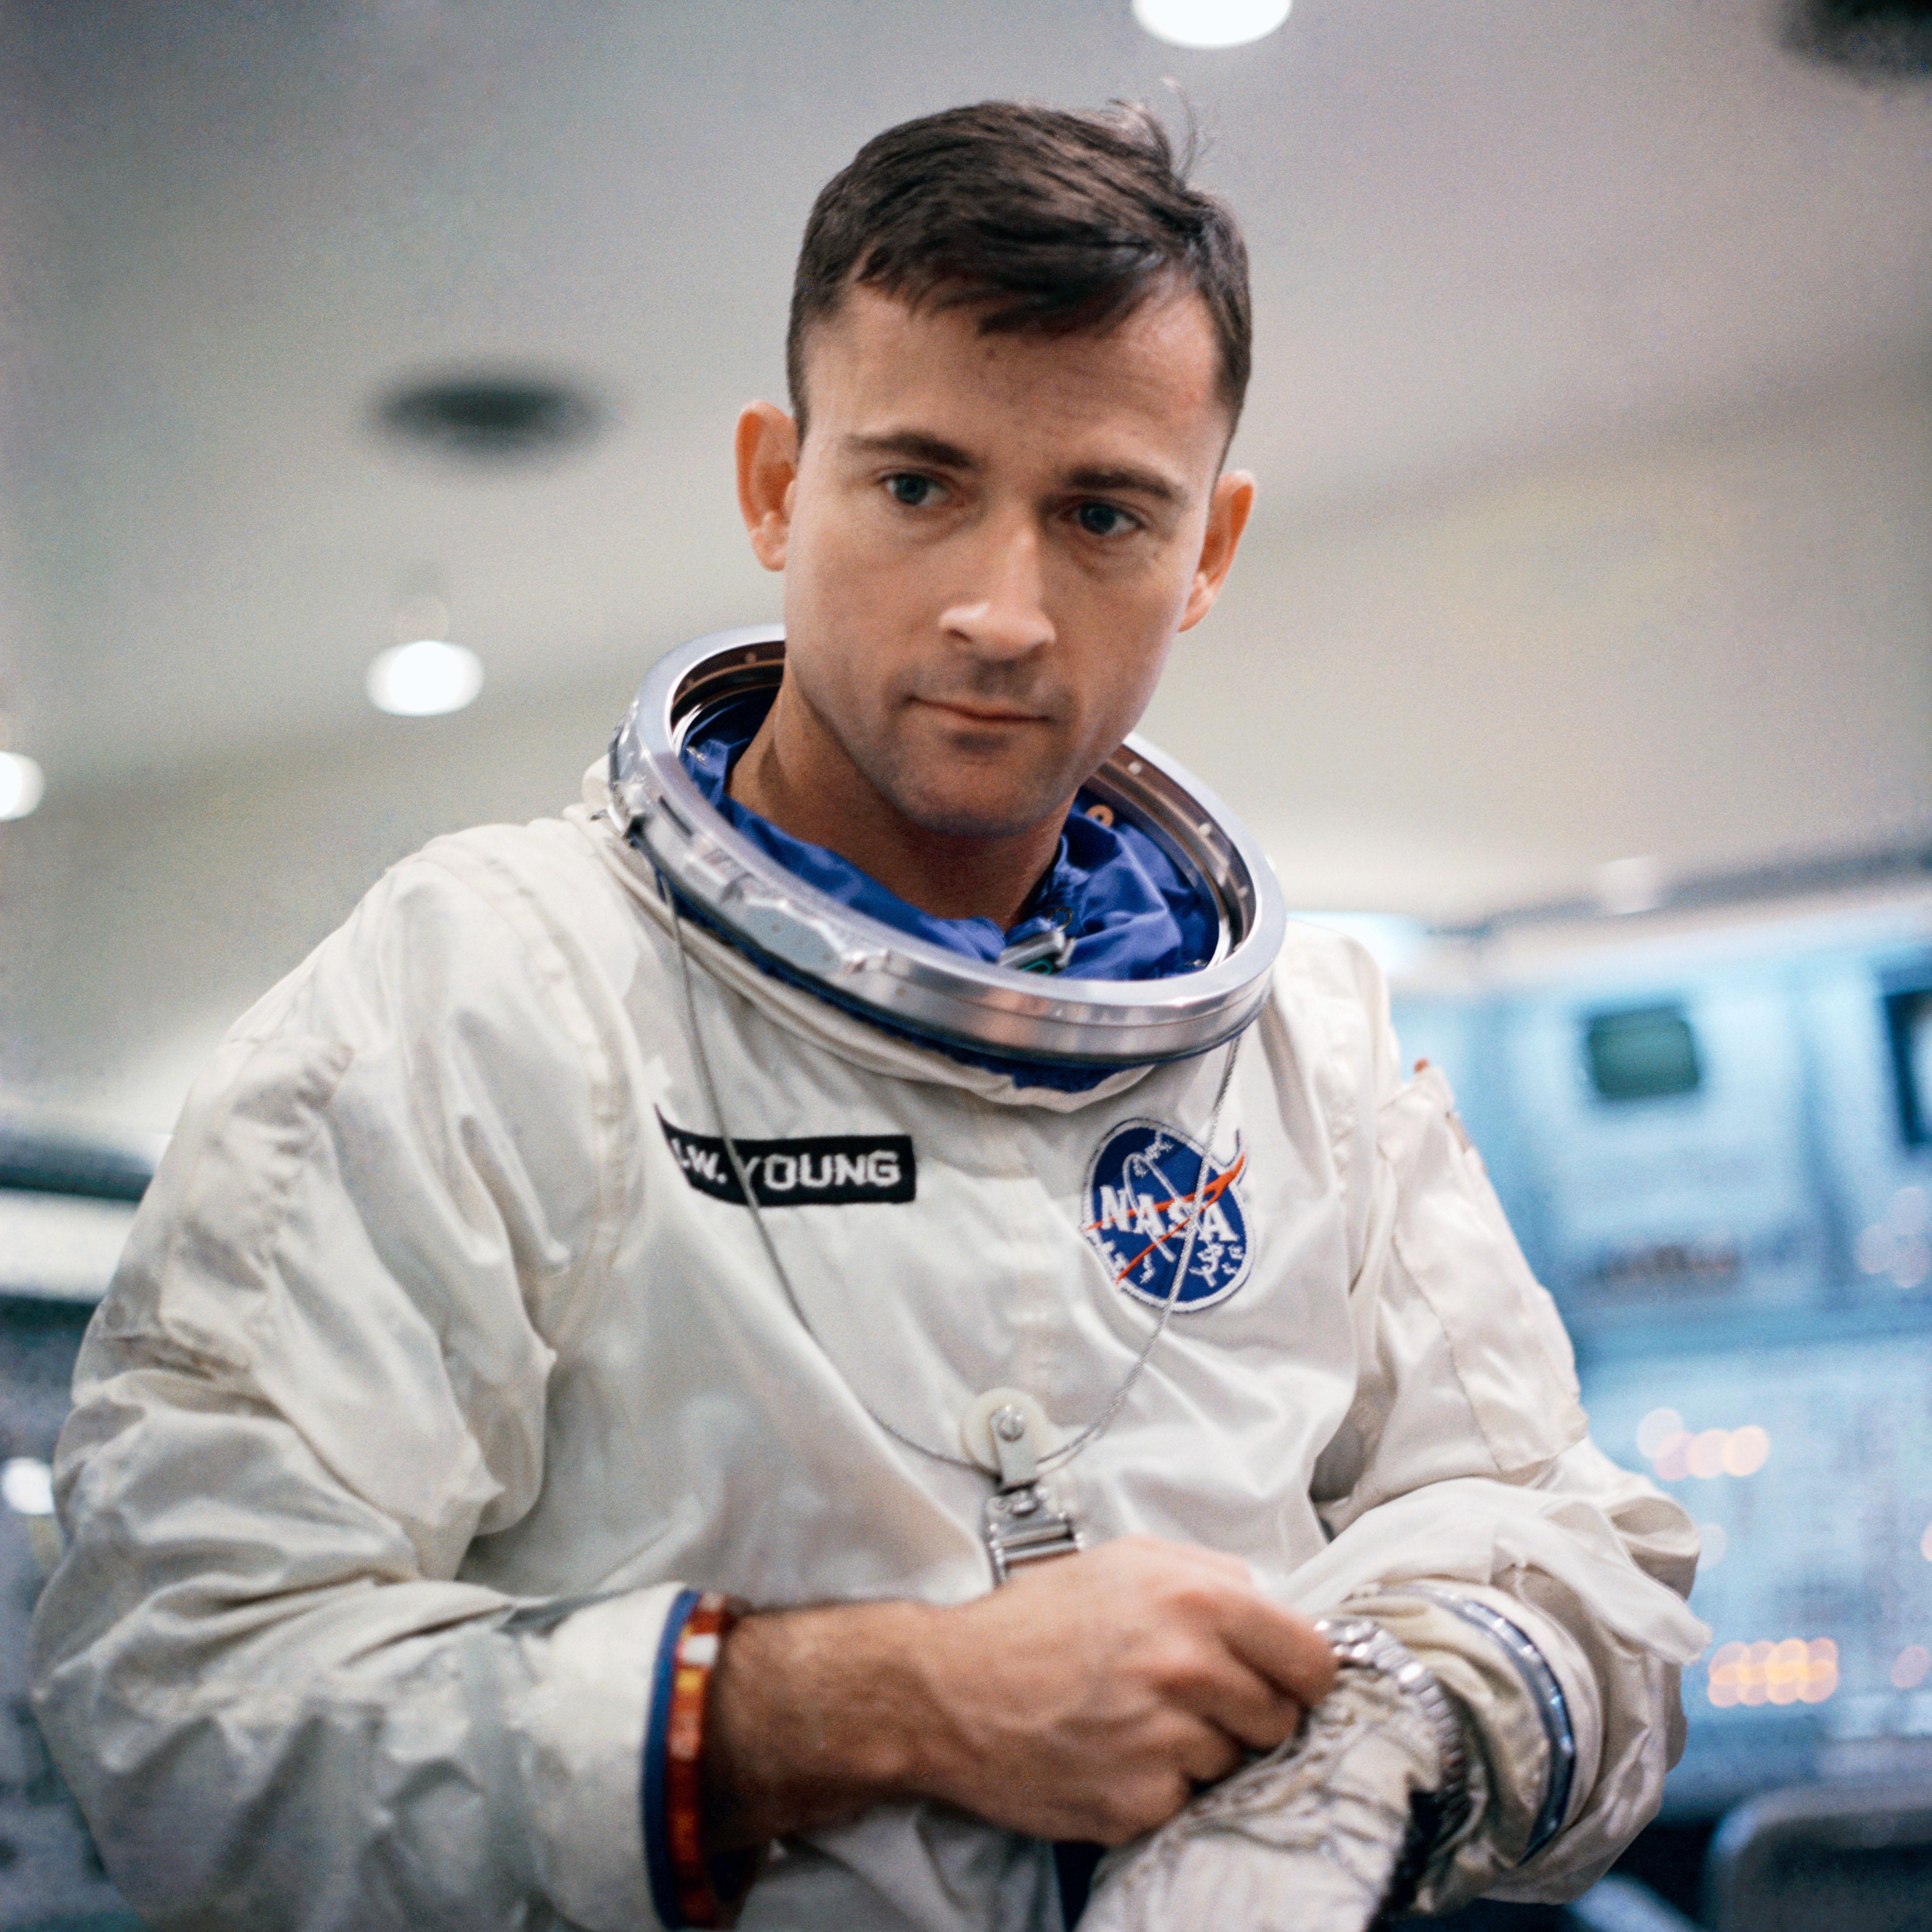 Astronaut_John_Young_gemini_3